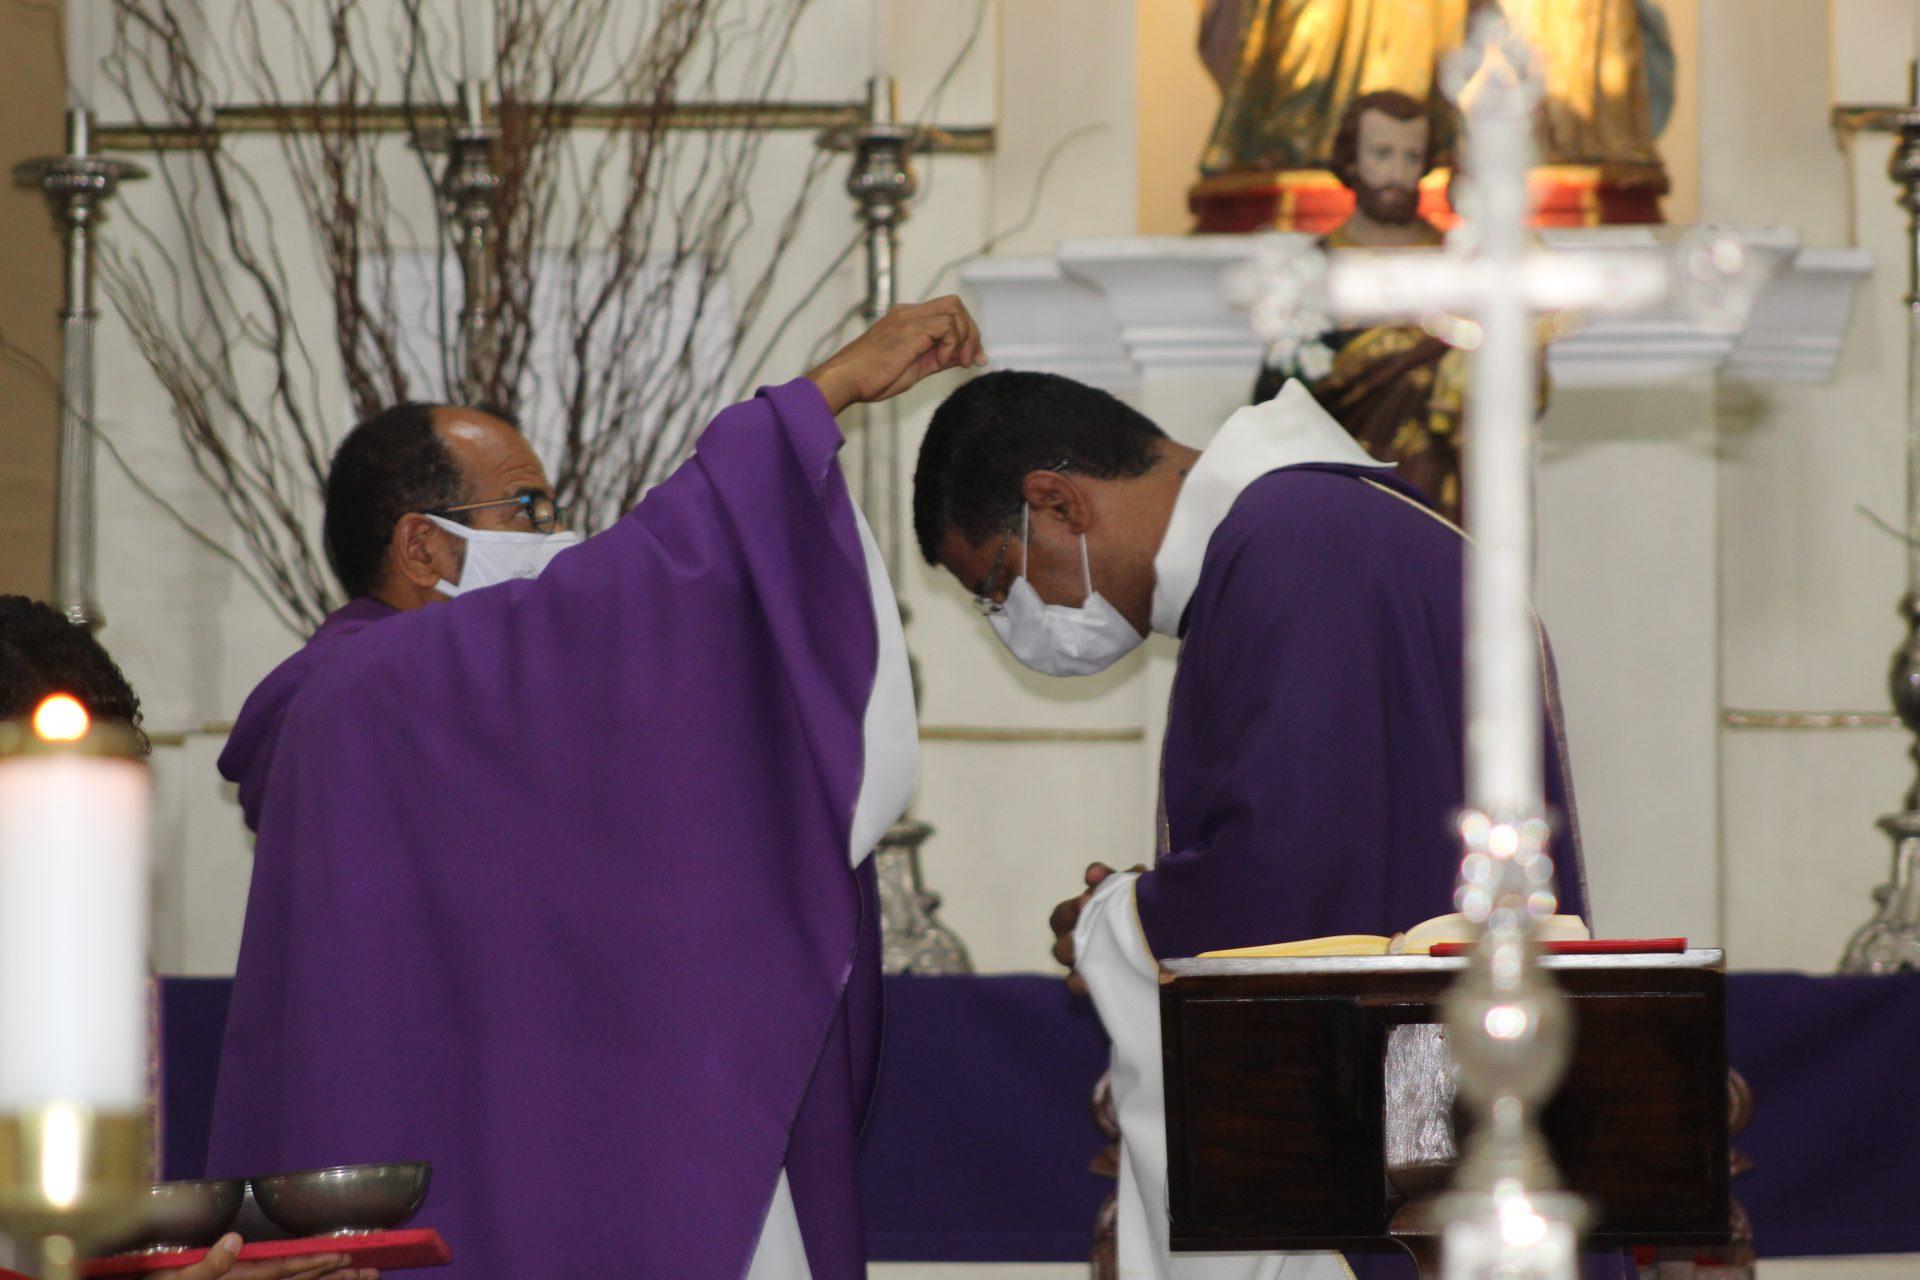 Quarta-feira de Cinzas | Santa Missa | 17/02/2021 - 17h